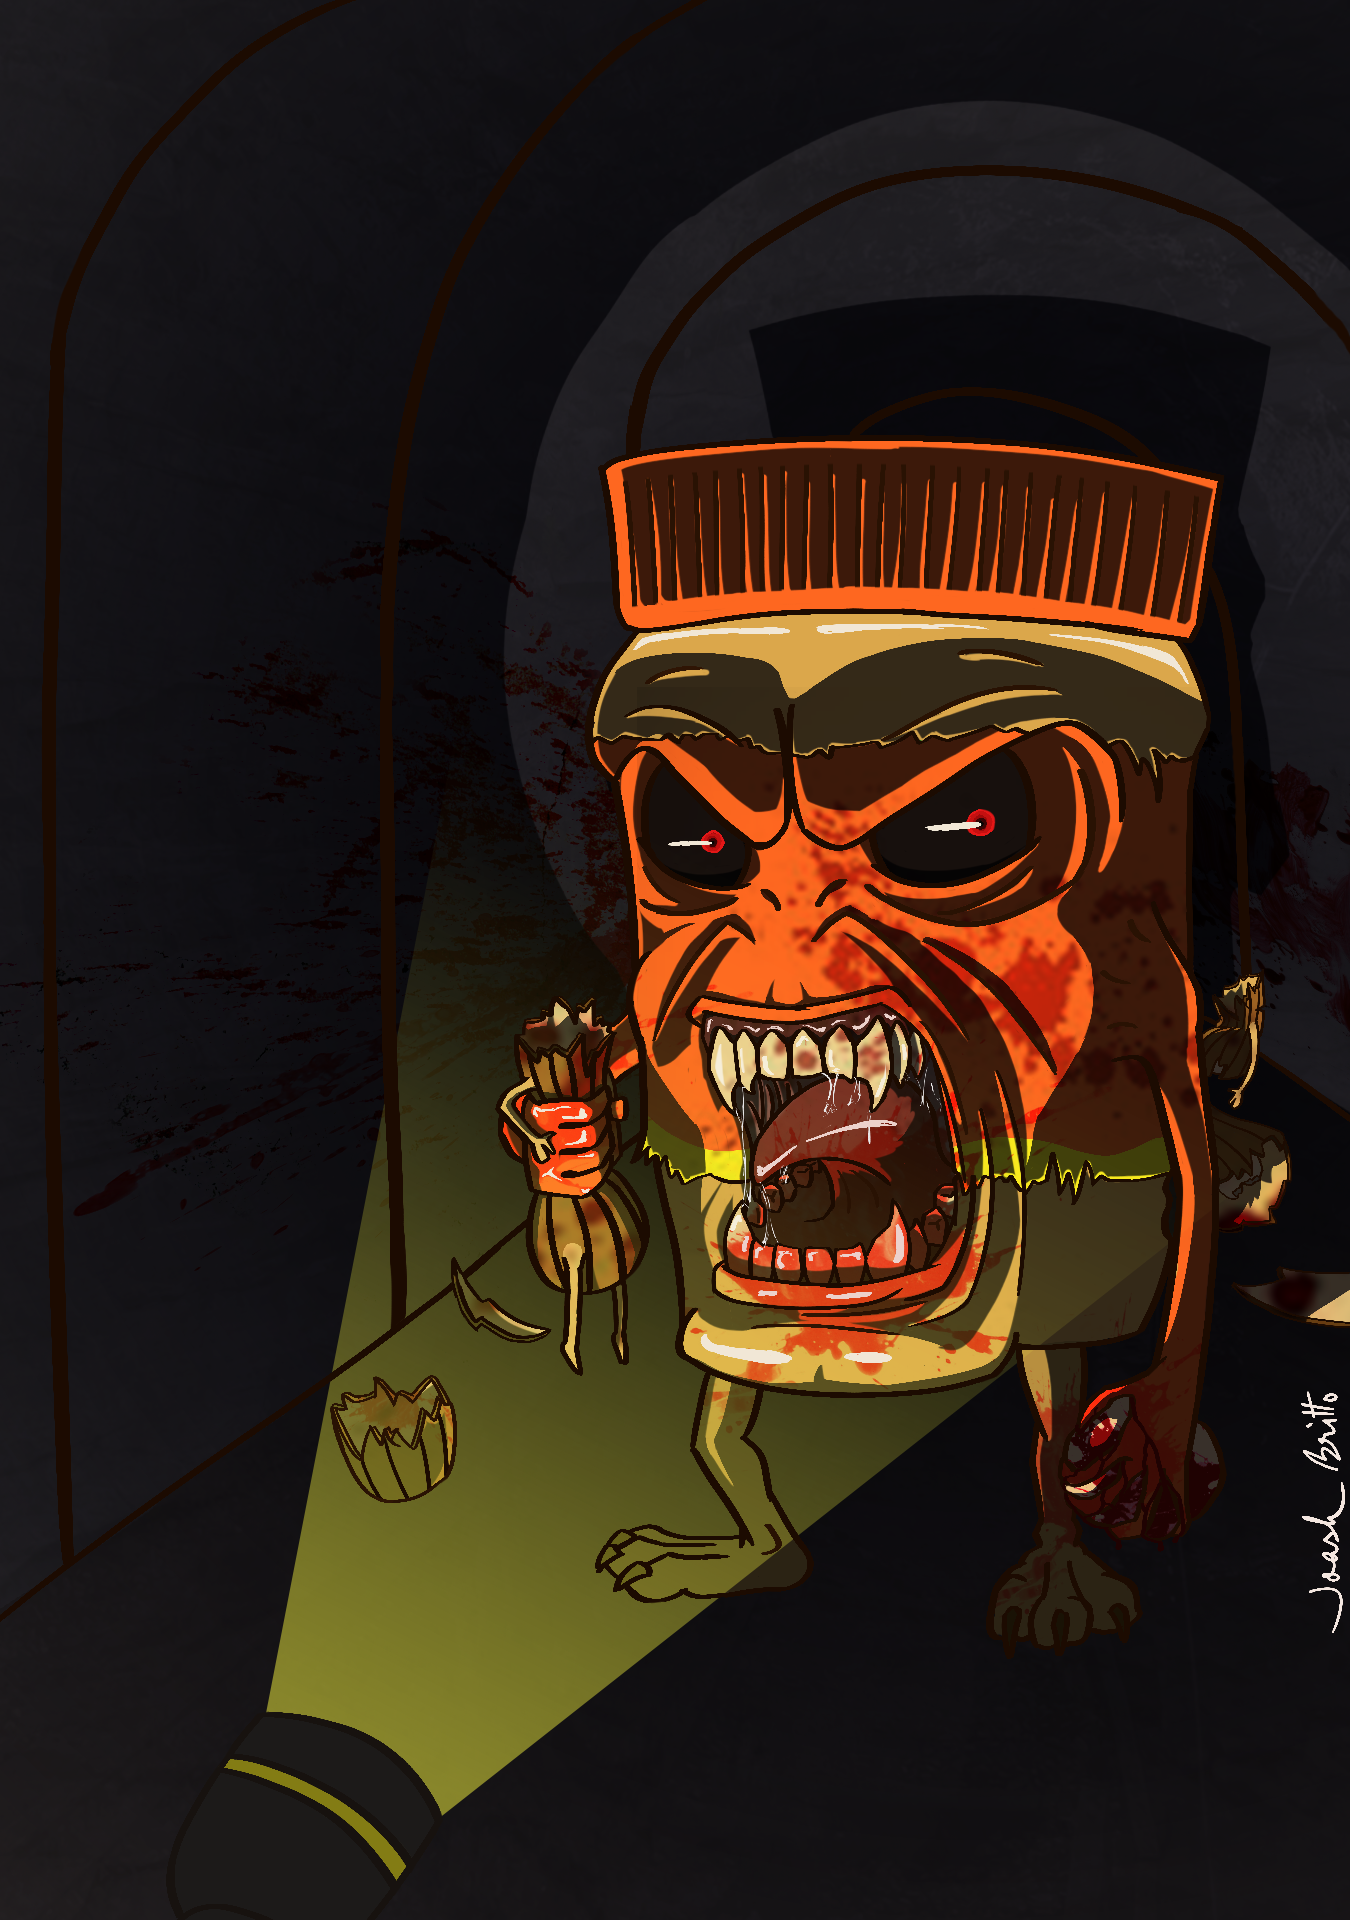 [Image: 622070_joashb_peanut-butter-monster.png?f1530255985]